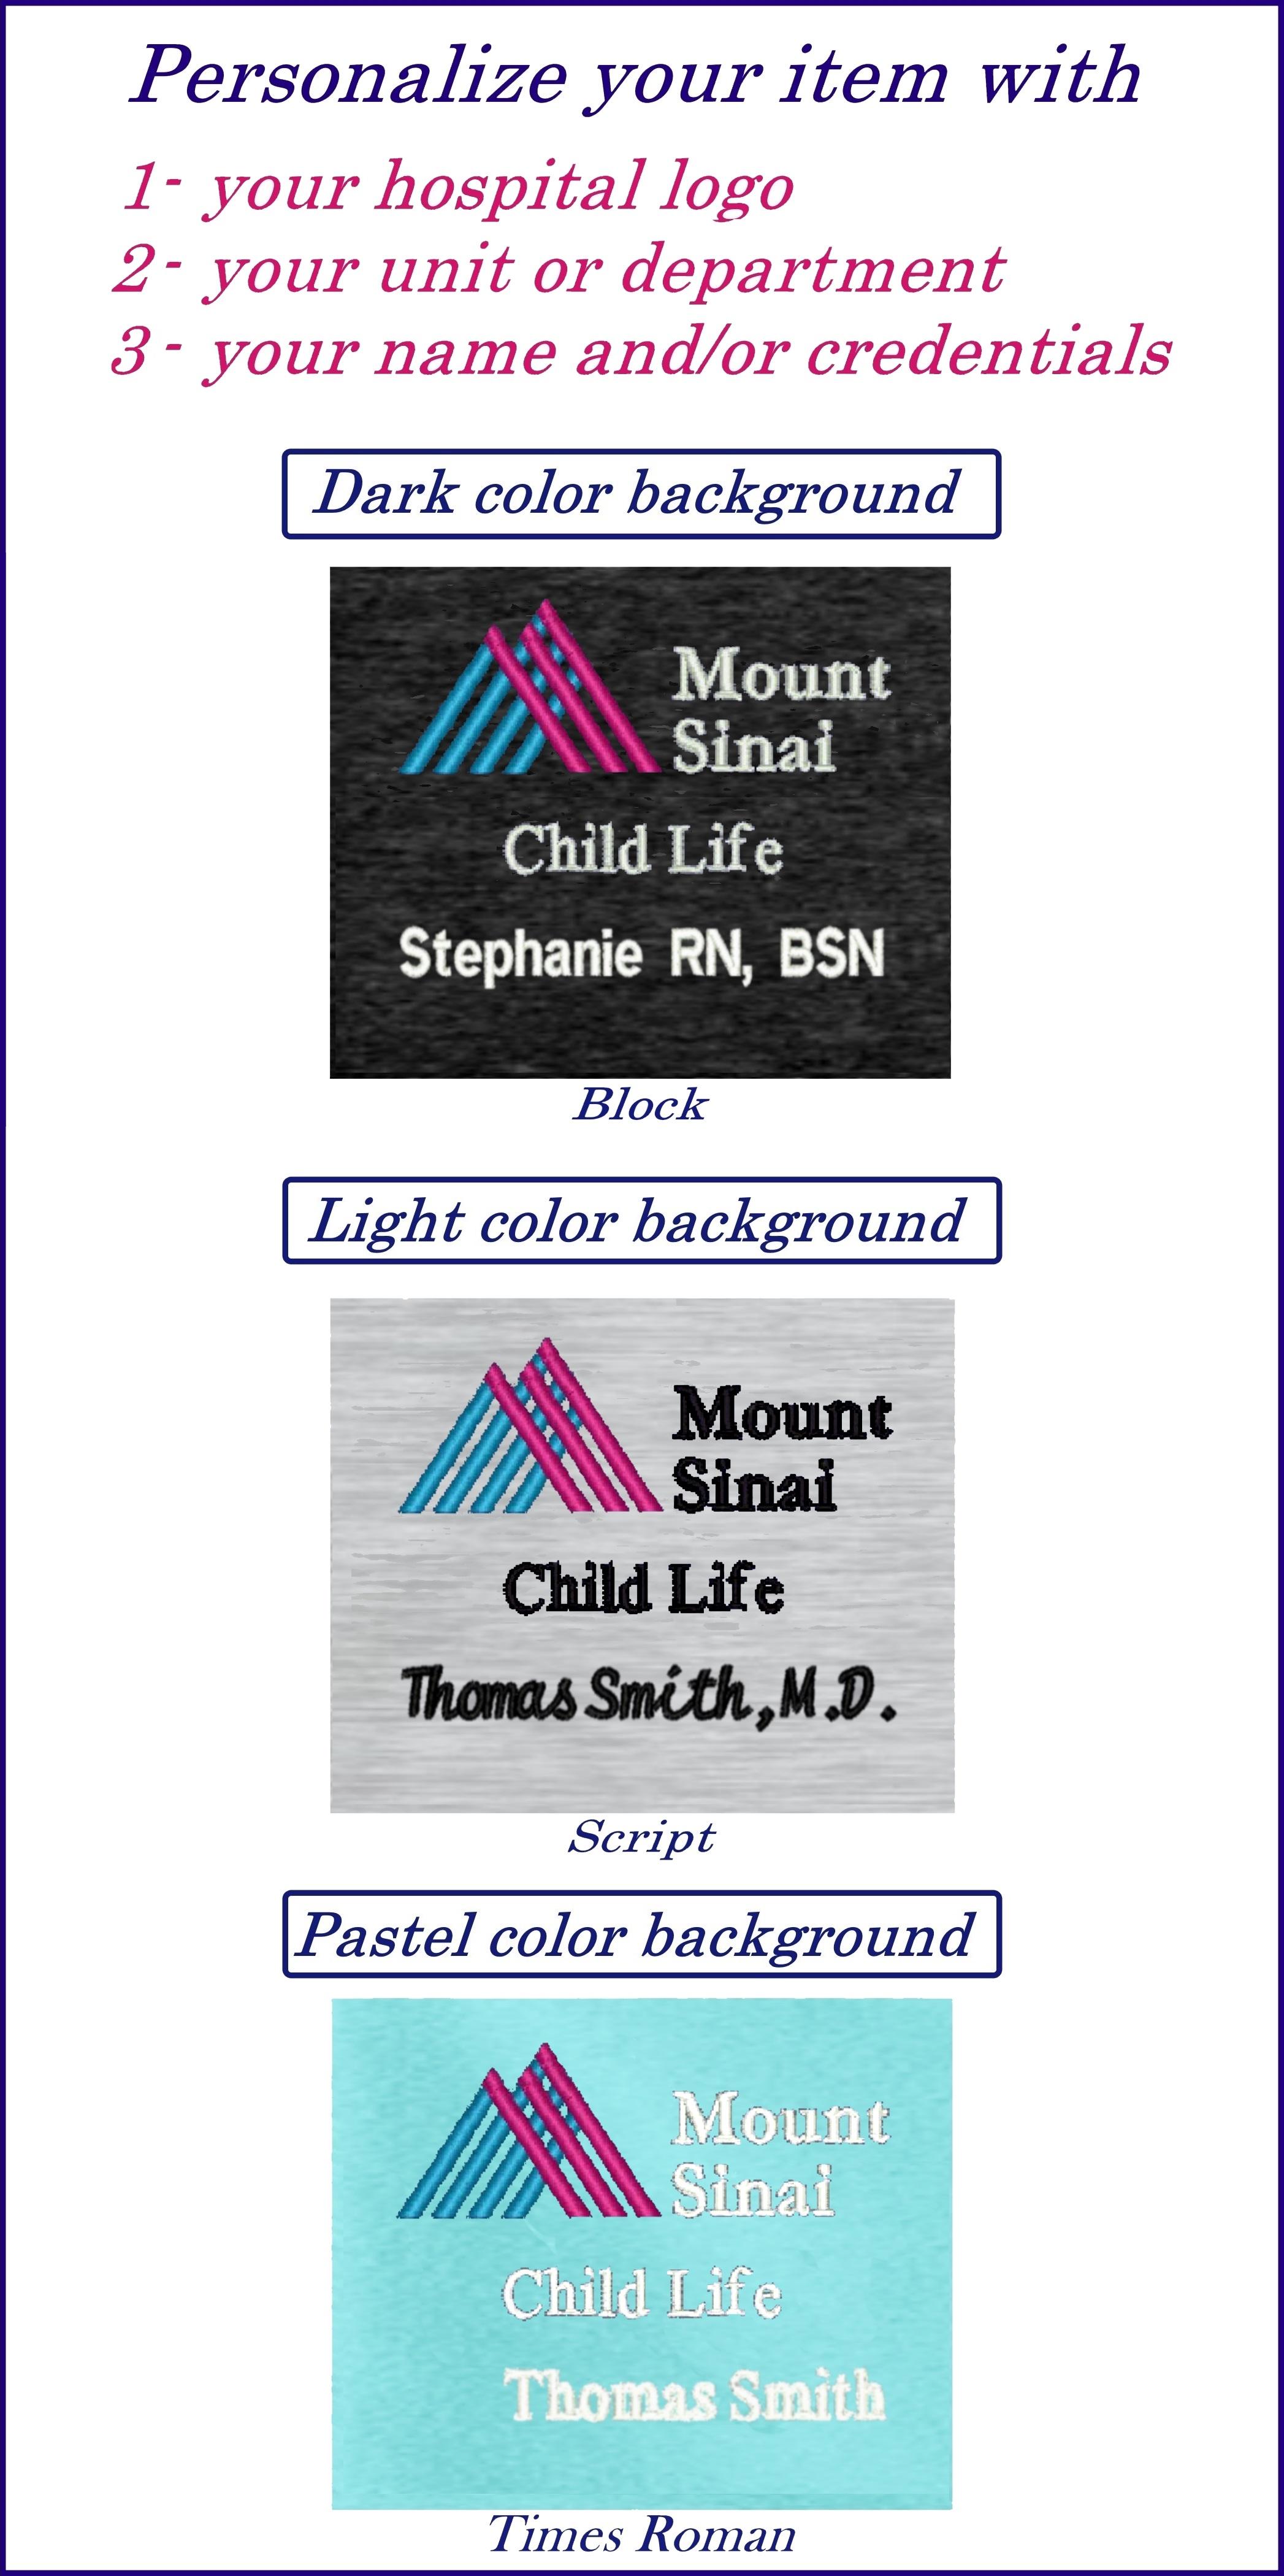 Allen's Hospital Uniforms Mount Sinai Hospital Apparel